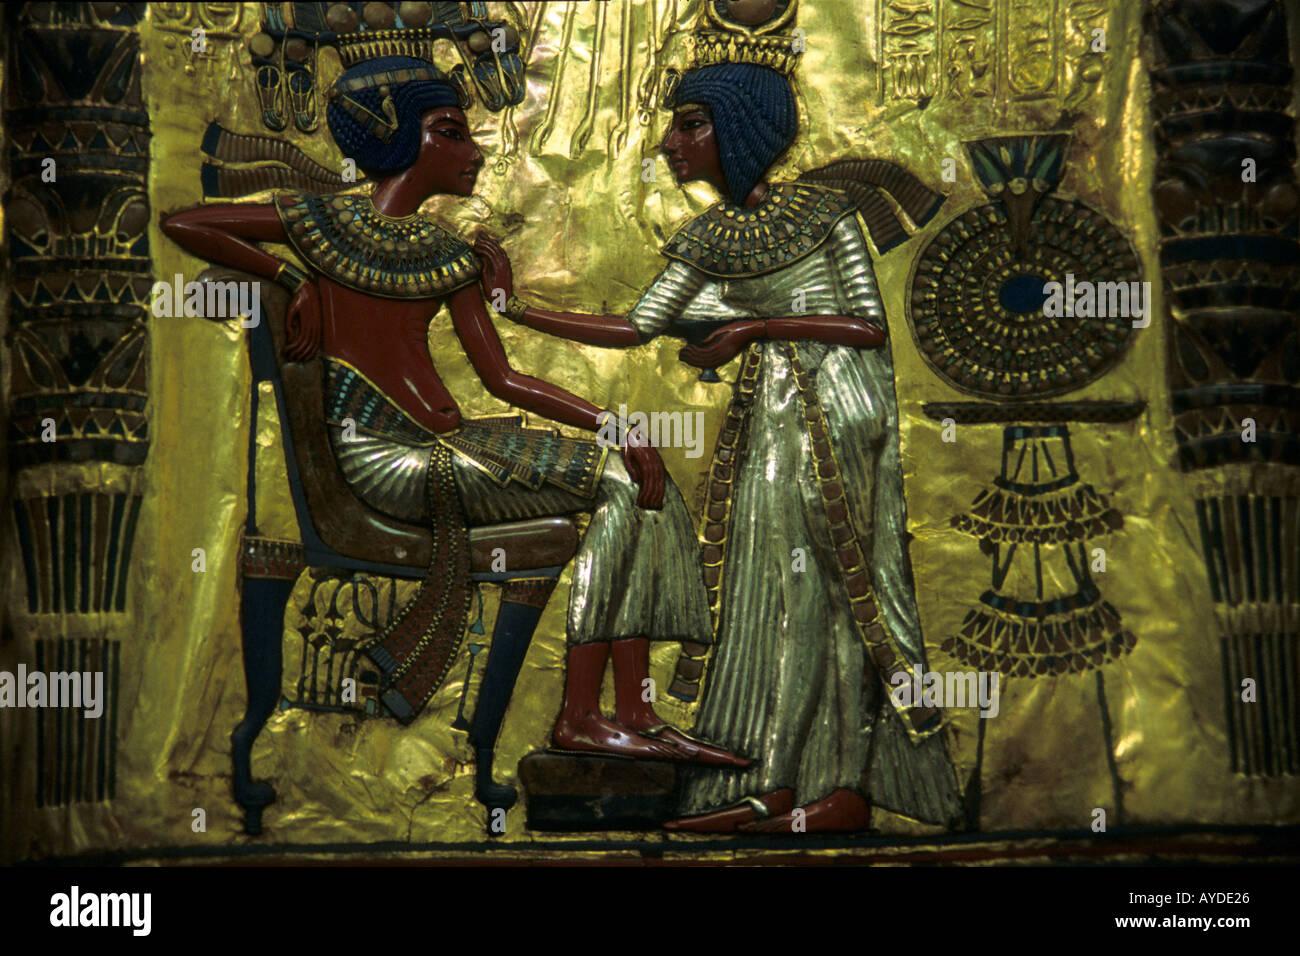 Egypt Cairo Egyptian Museum Tutankhamun s throne - Stock Image